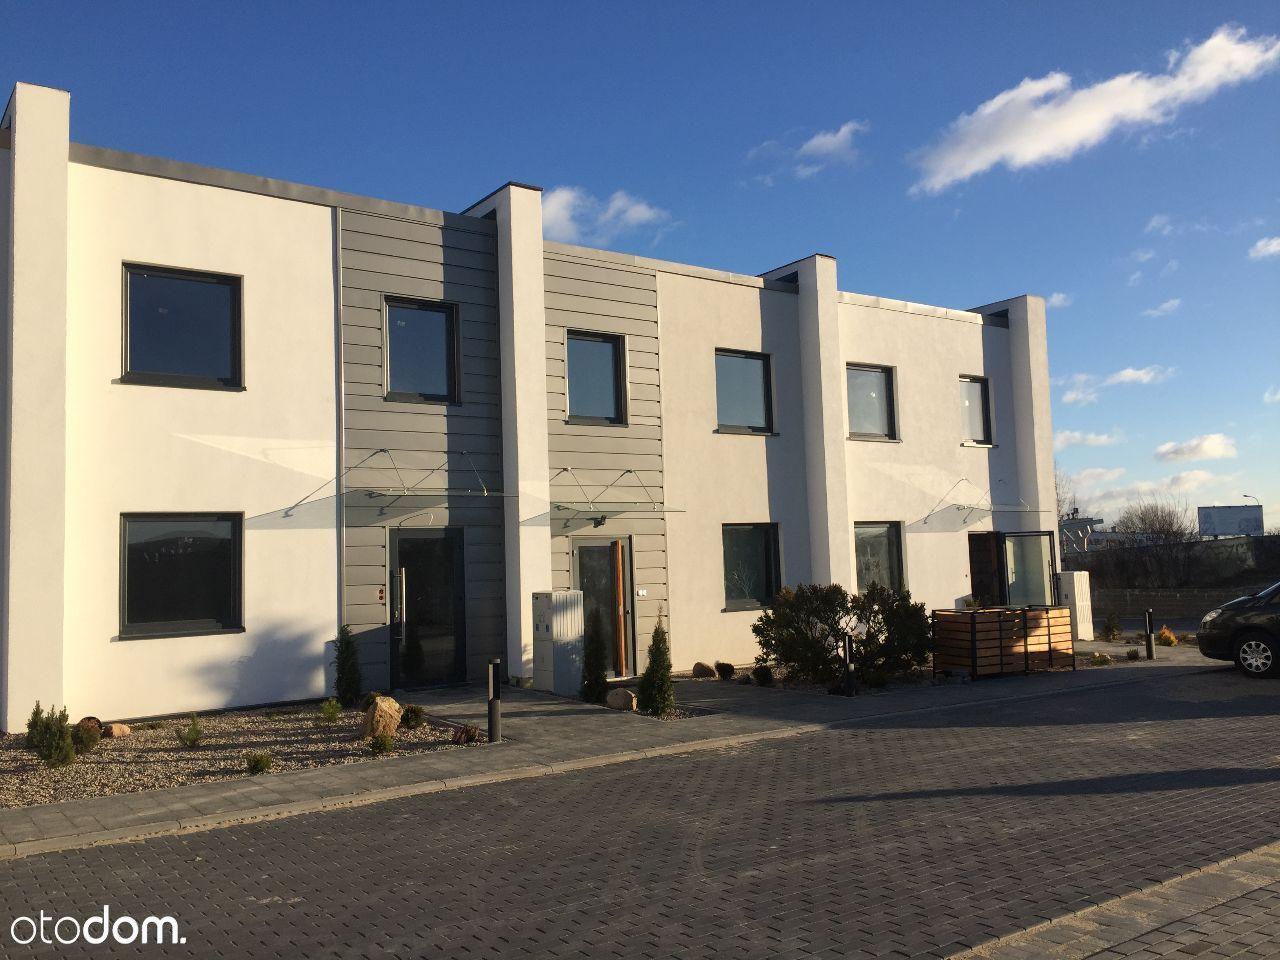 Mieszkanie na sprzedaż, Chojnice, chojnicki, pomorskie - Foto 2